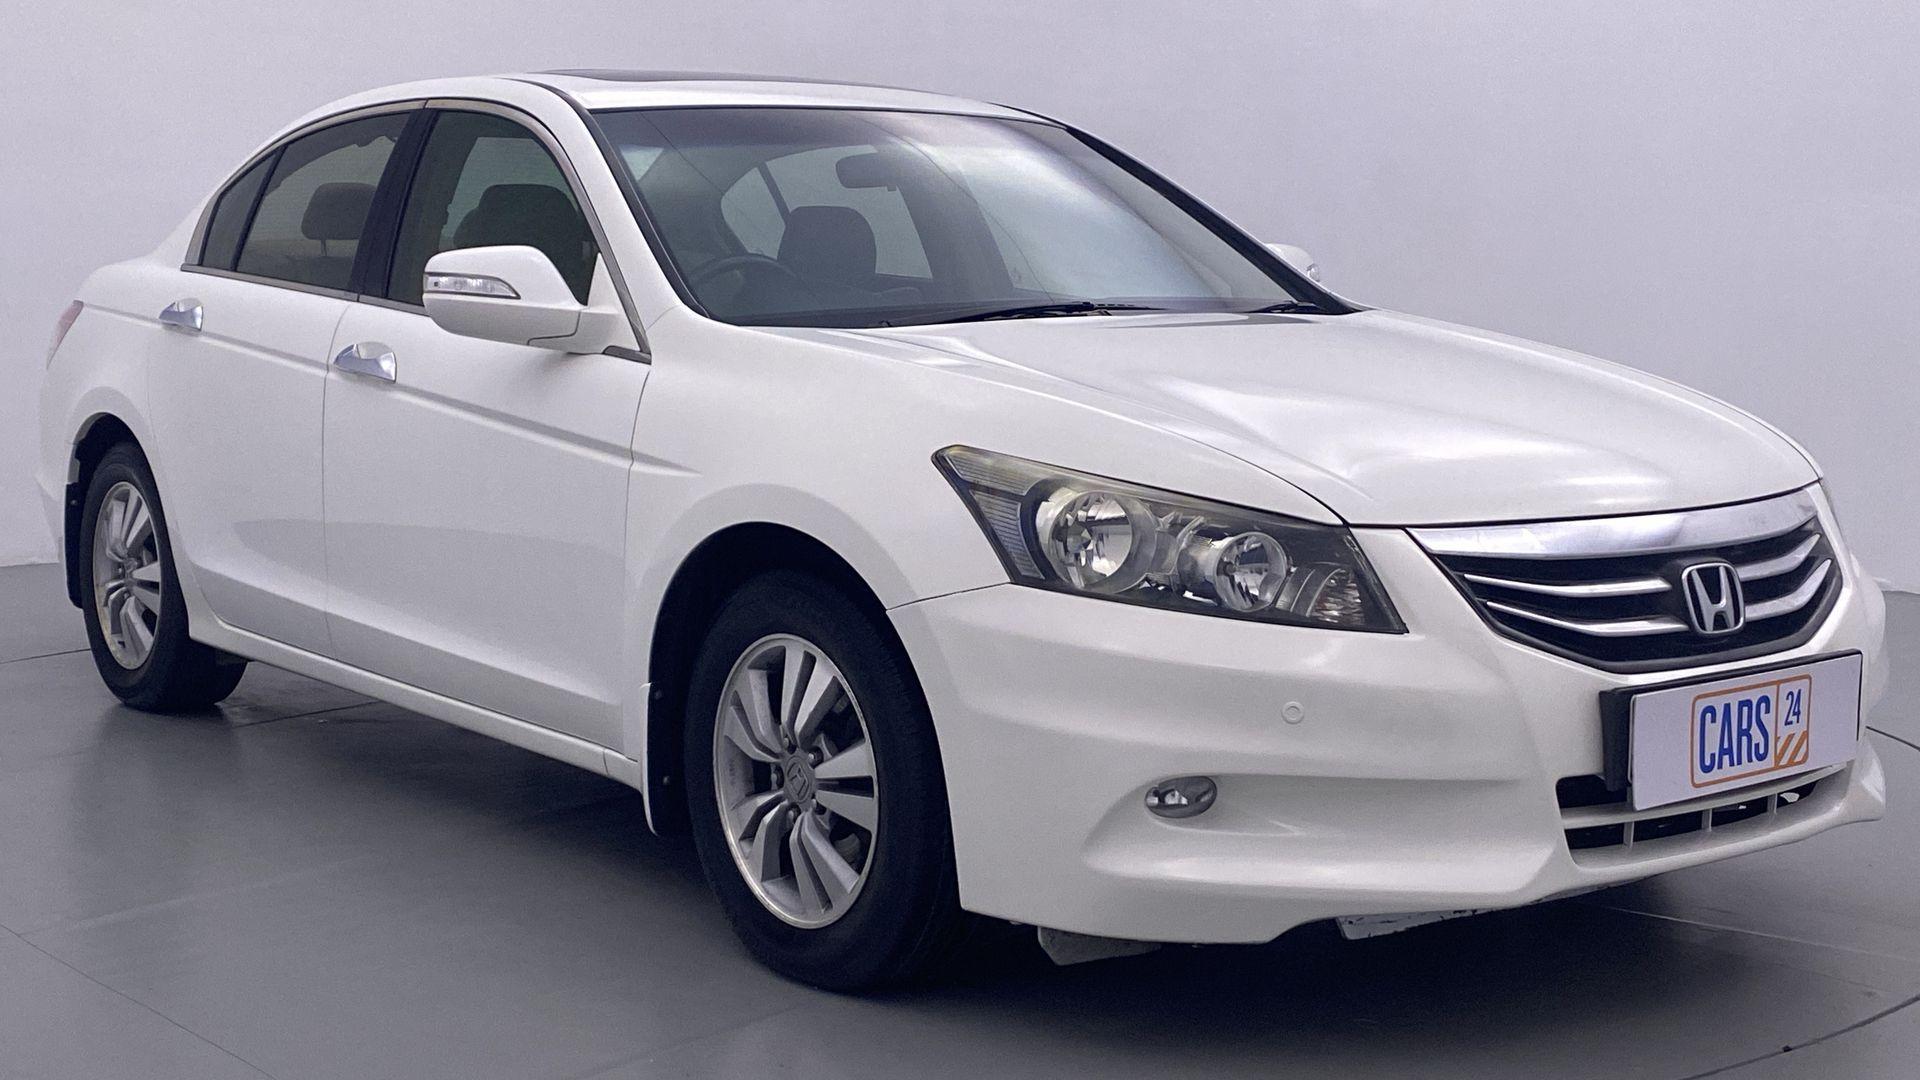 2011 Honda Accord 2.4 MT